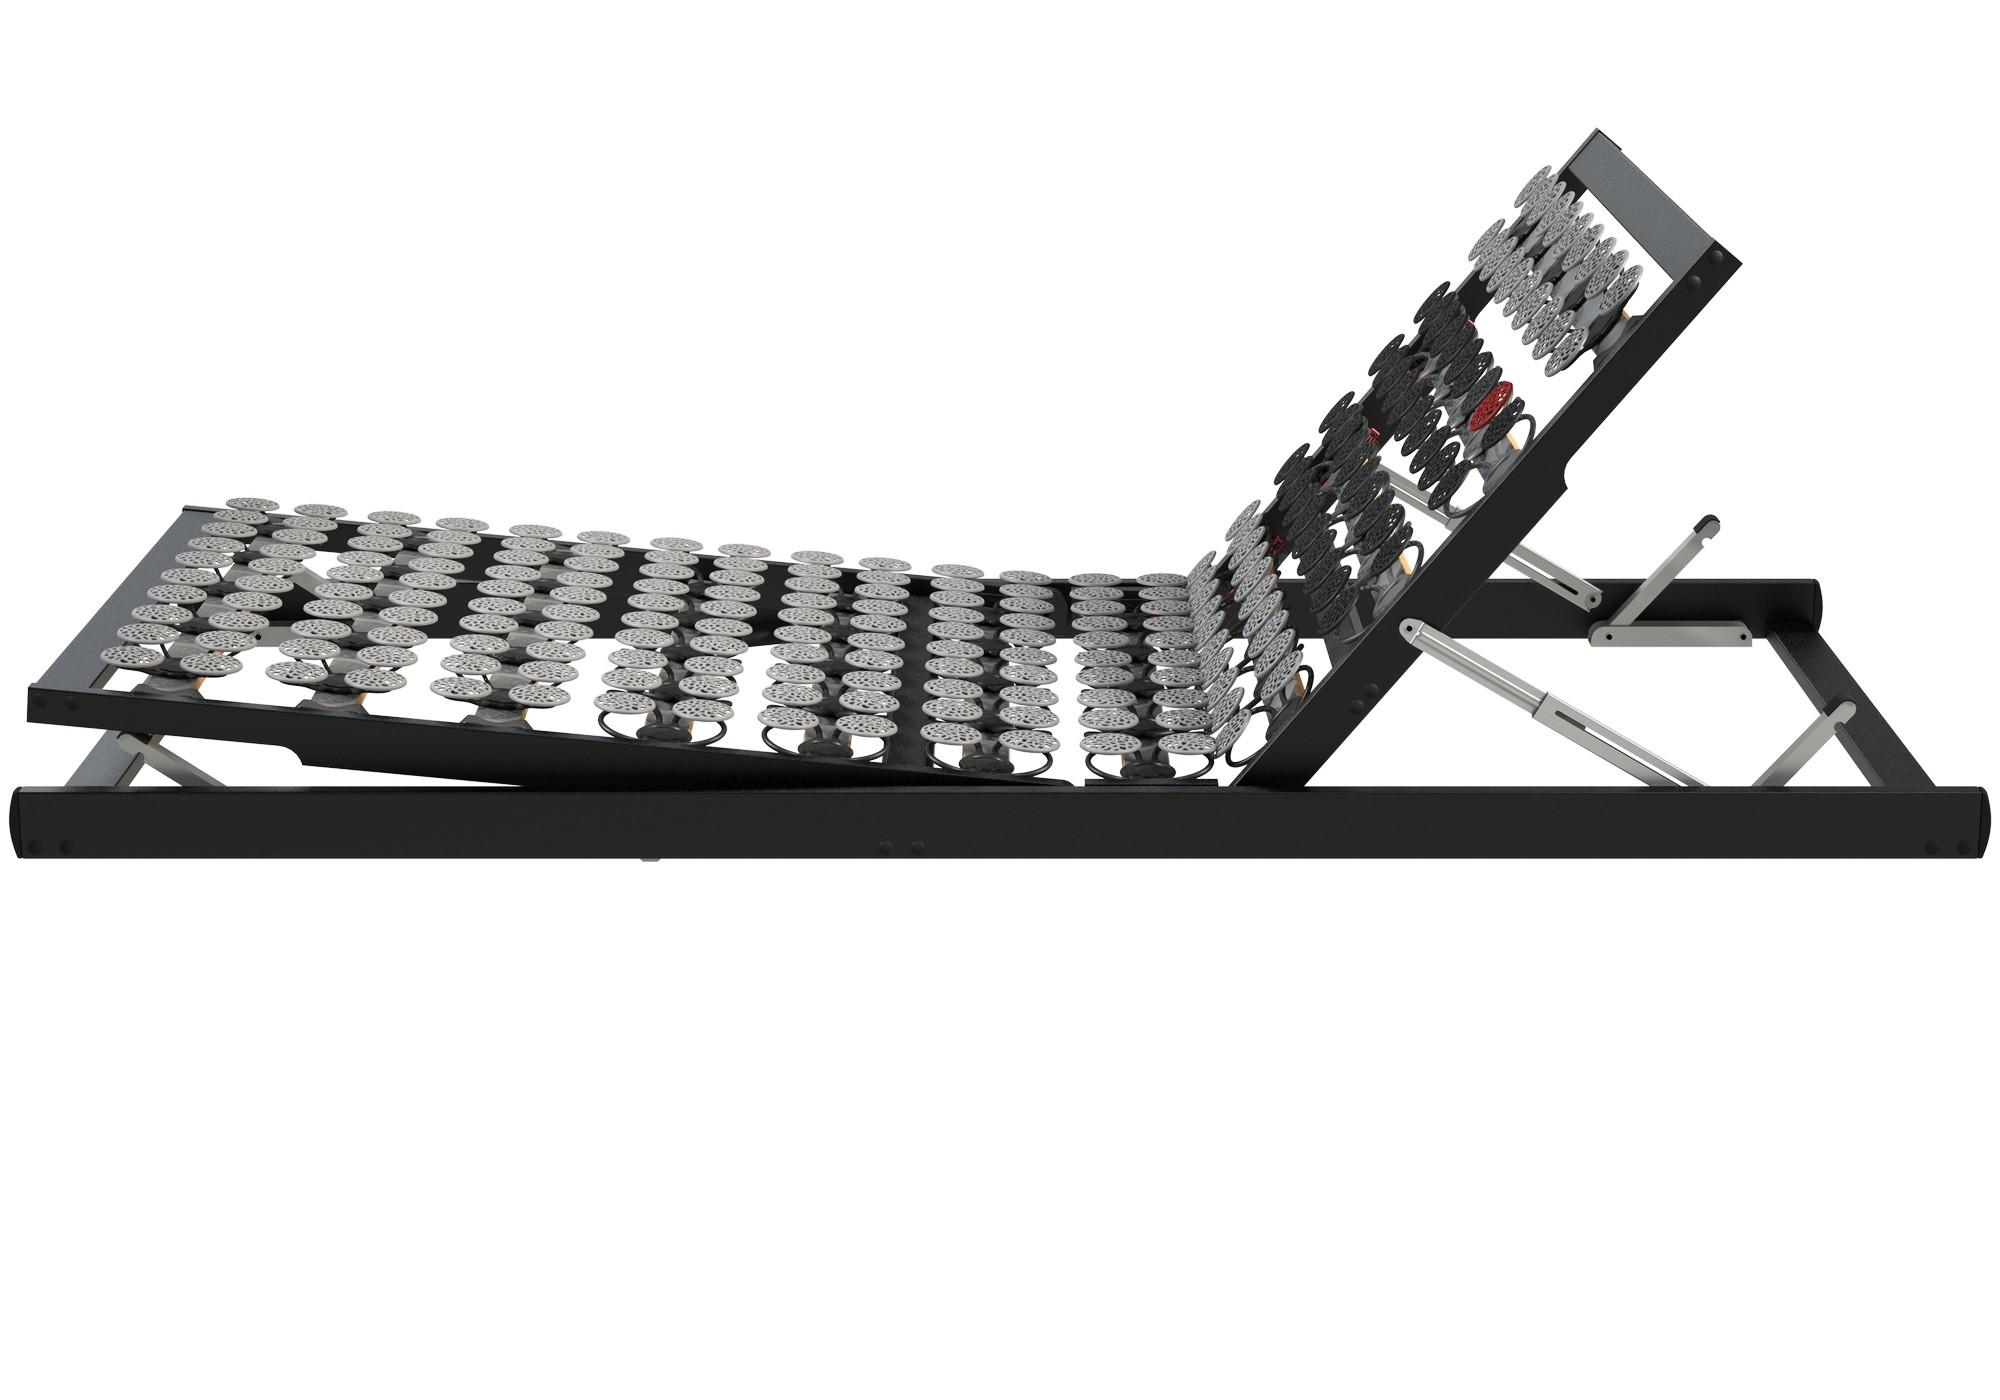 Grosana Airflex SENSITIVE KF Komfort Unterfederung - Kopfteilhöhe 1